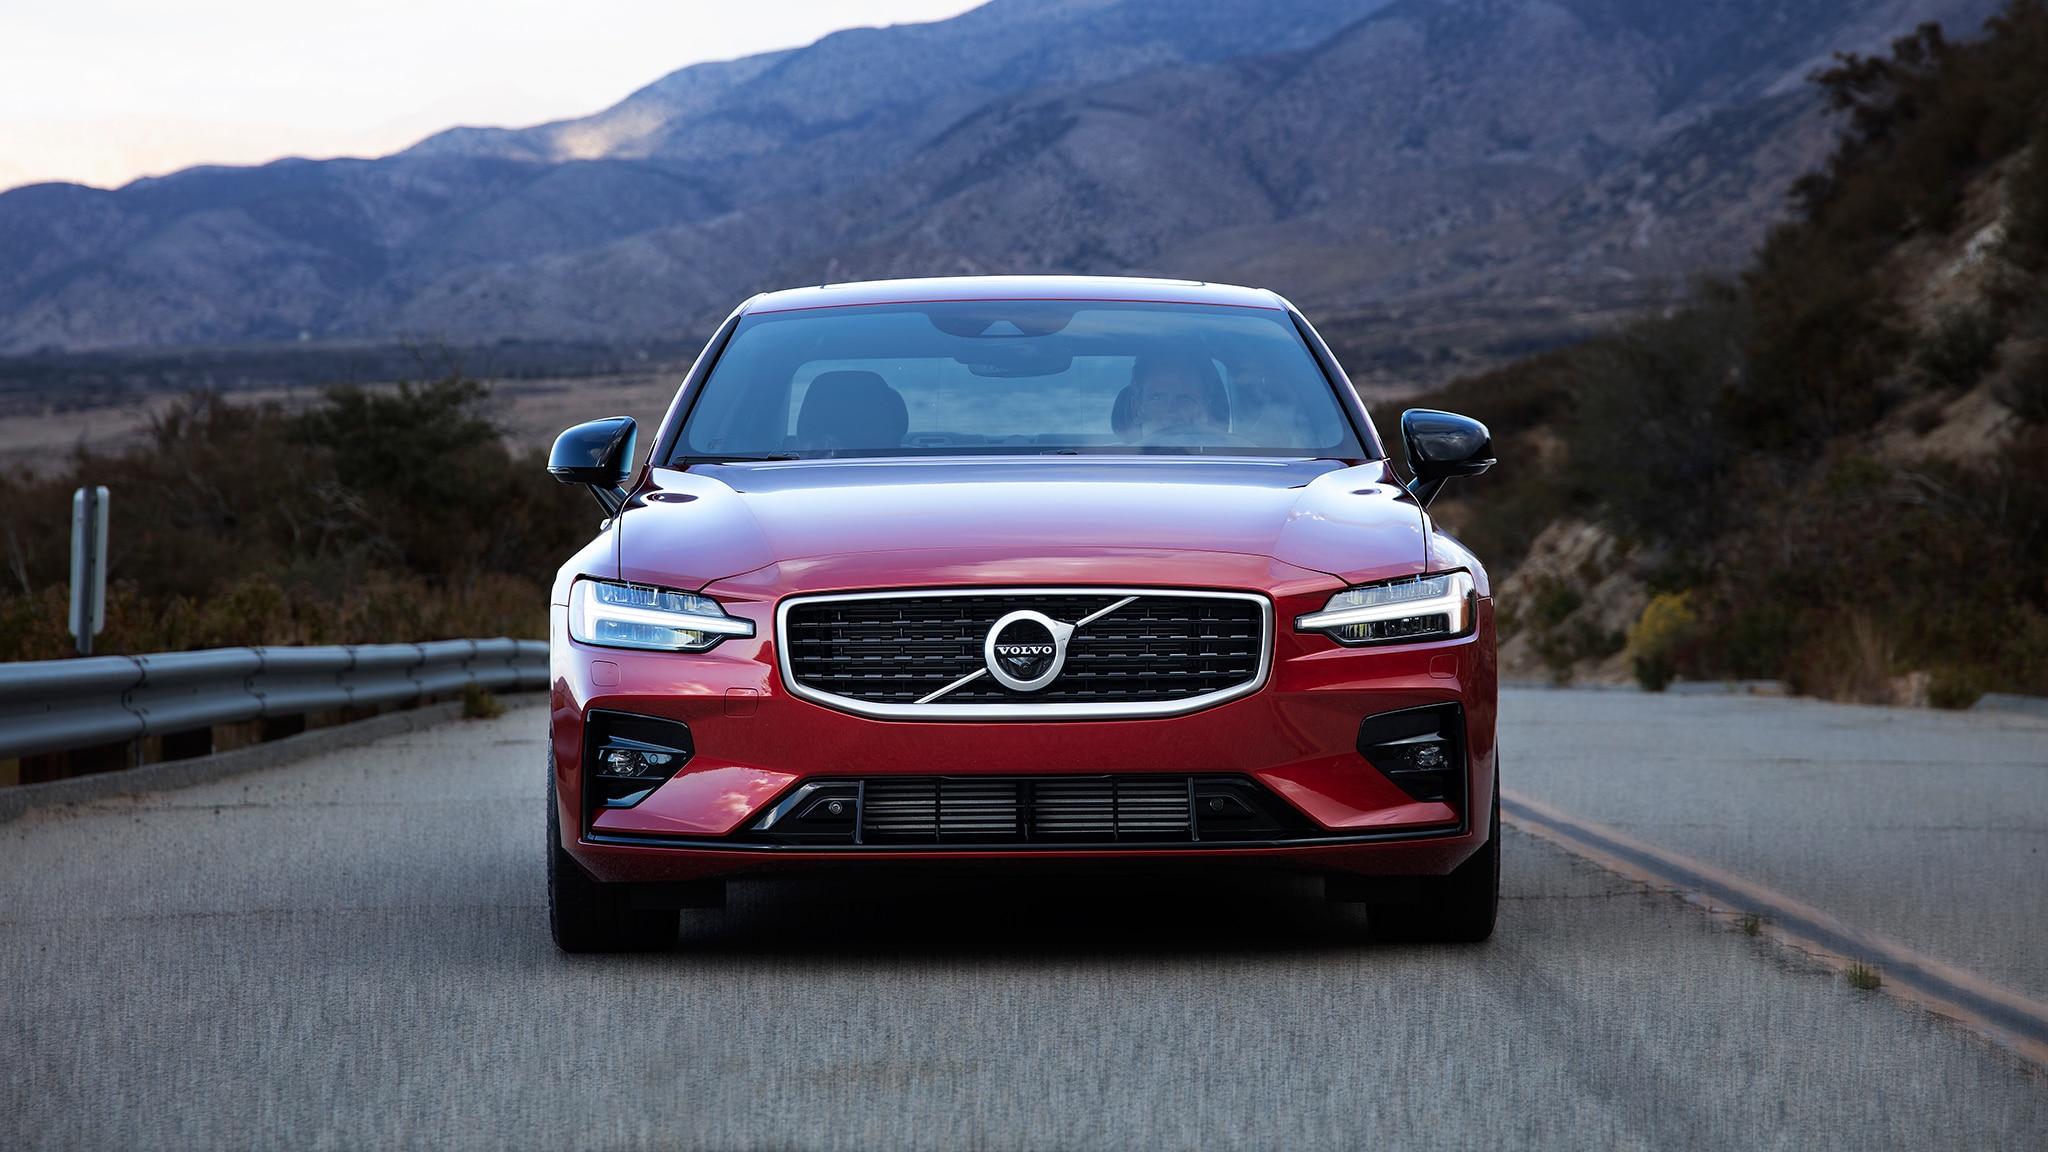 2019 Volvo S60 T6 R Design Front 2